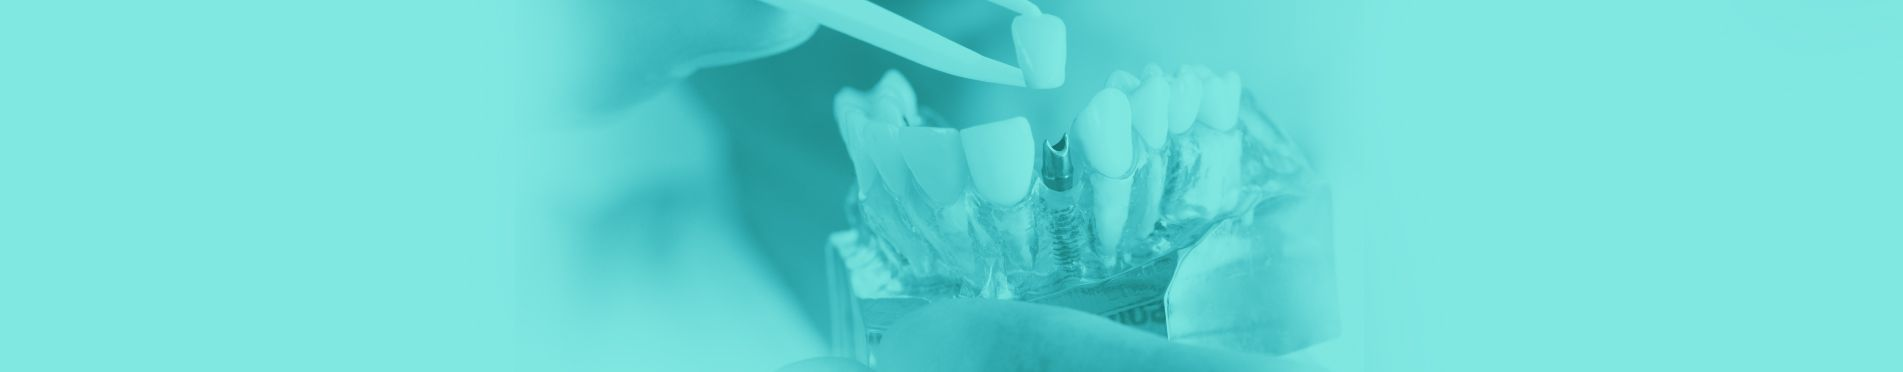 بنر ایمپلنت دندان